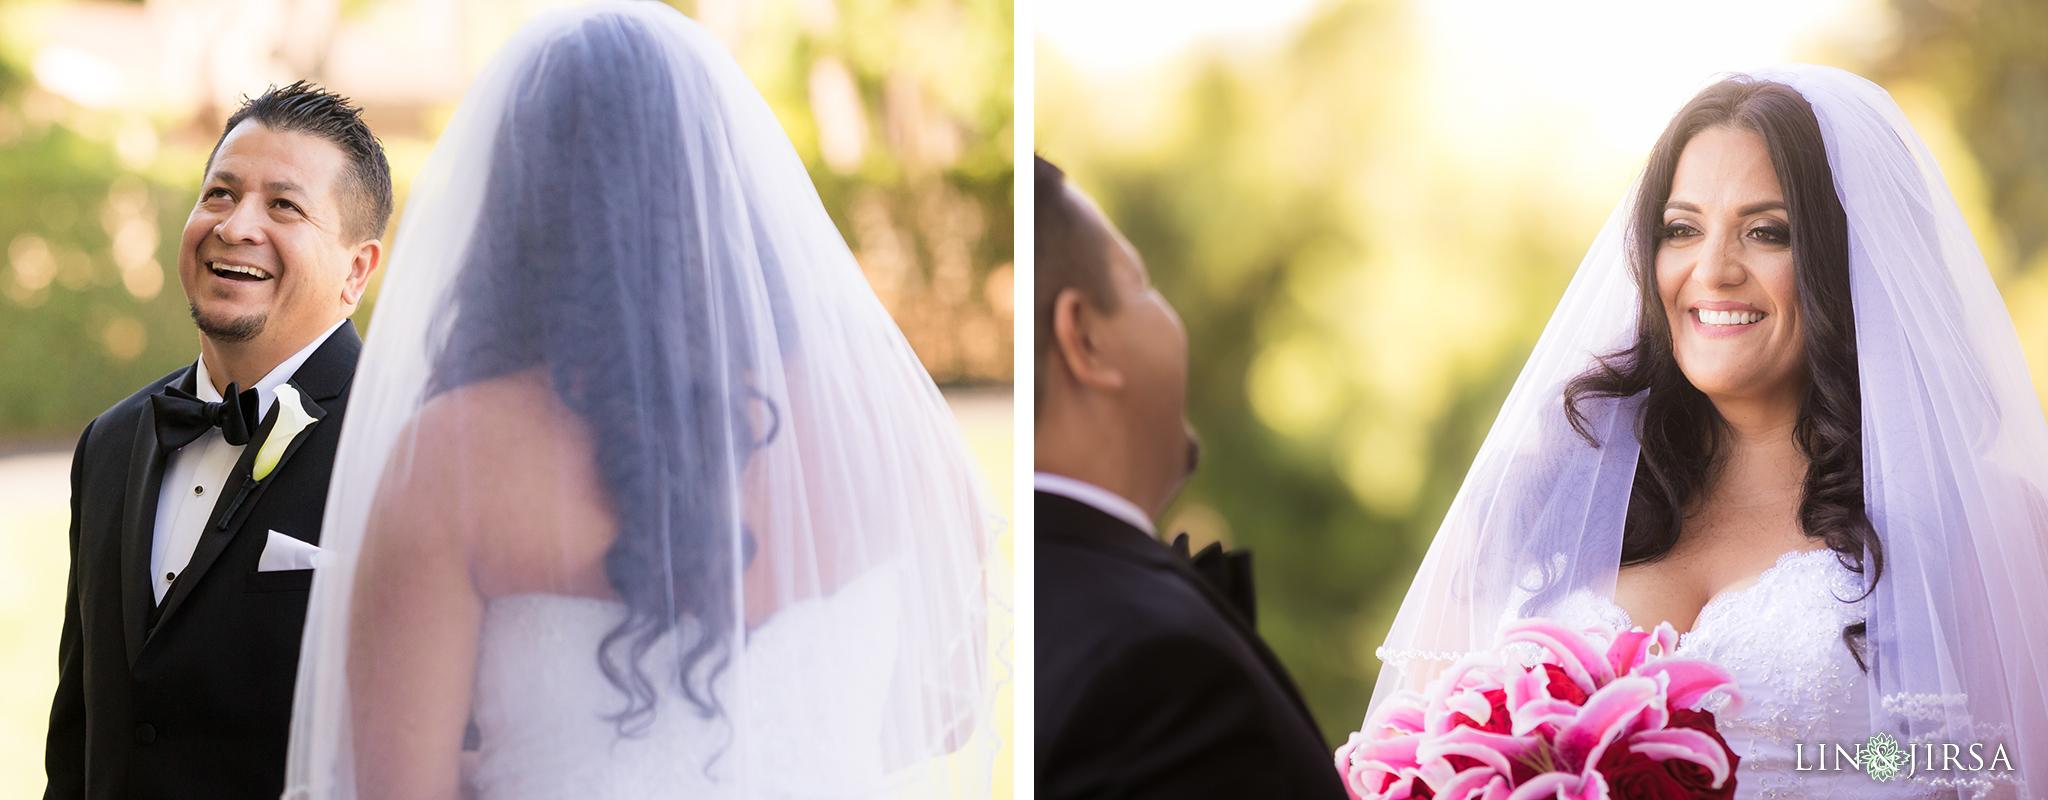 06-grand-tradition-estate-fallbrook-wedding-photography